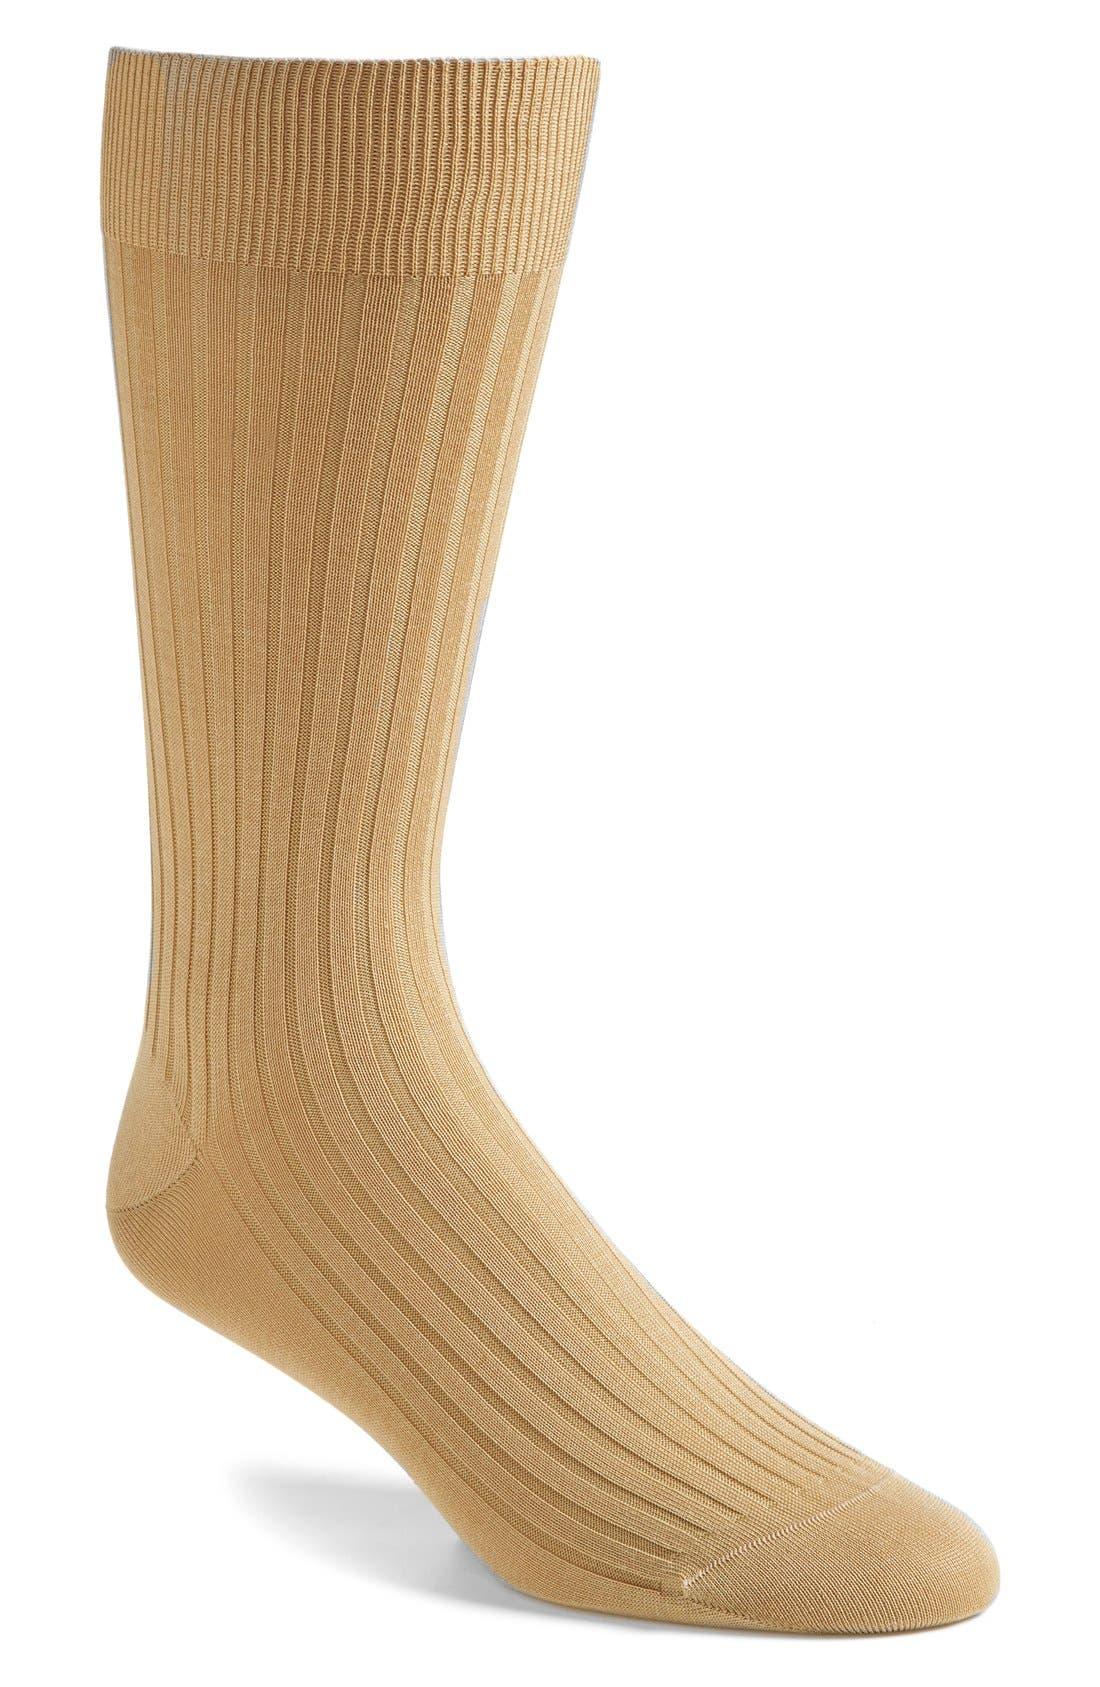 Pantherella Cotton Blend Mid Calf Dress Socks